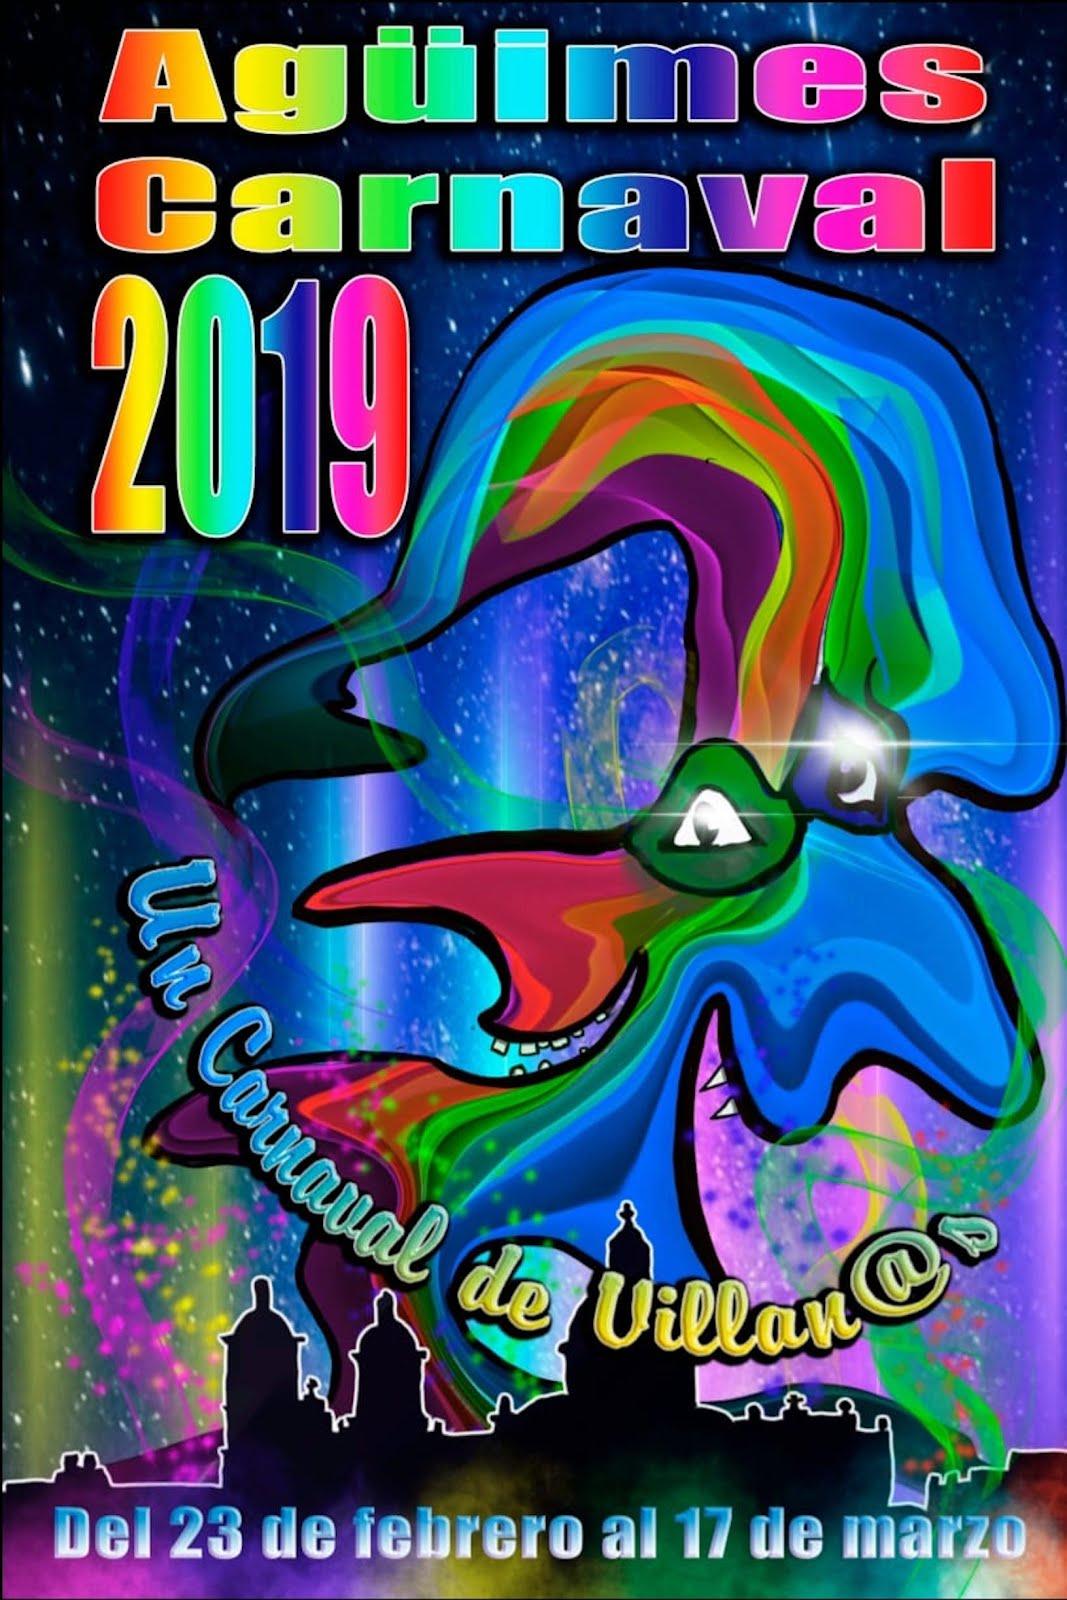 Carnaval de Agüimes 2019